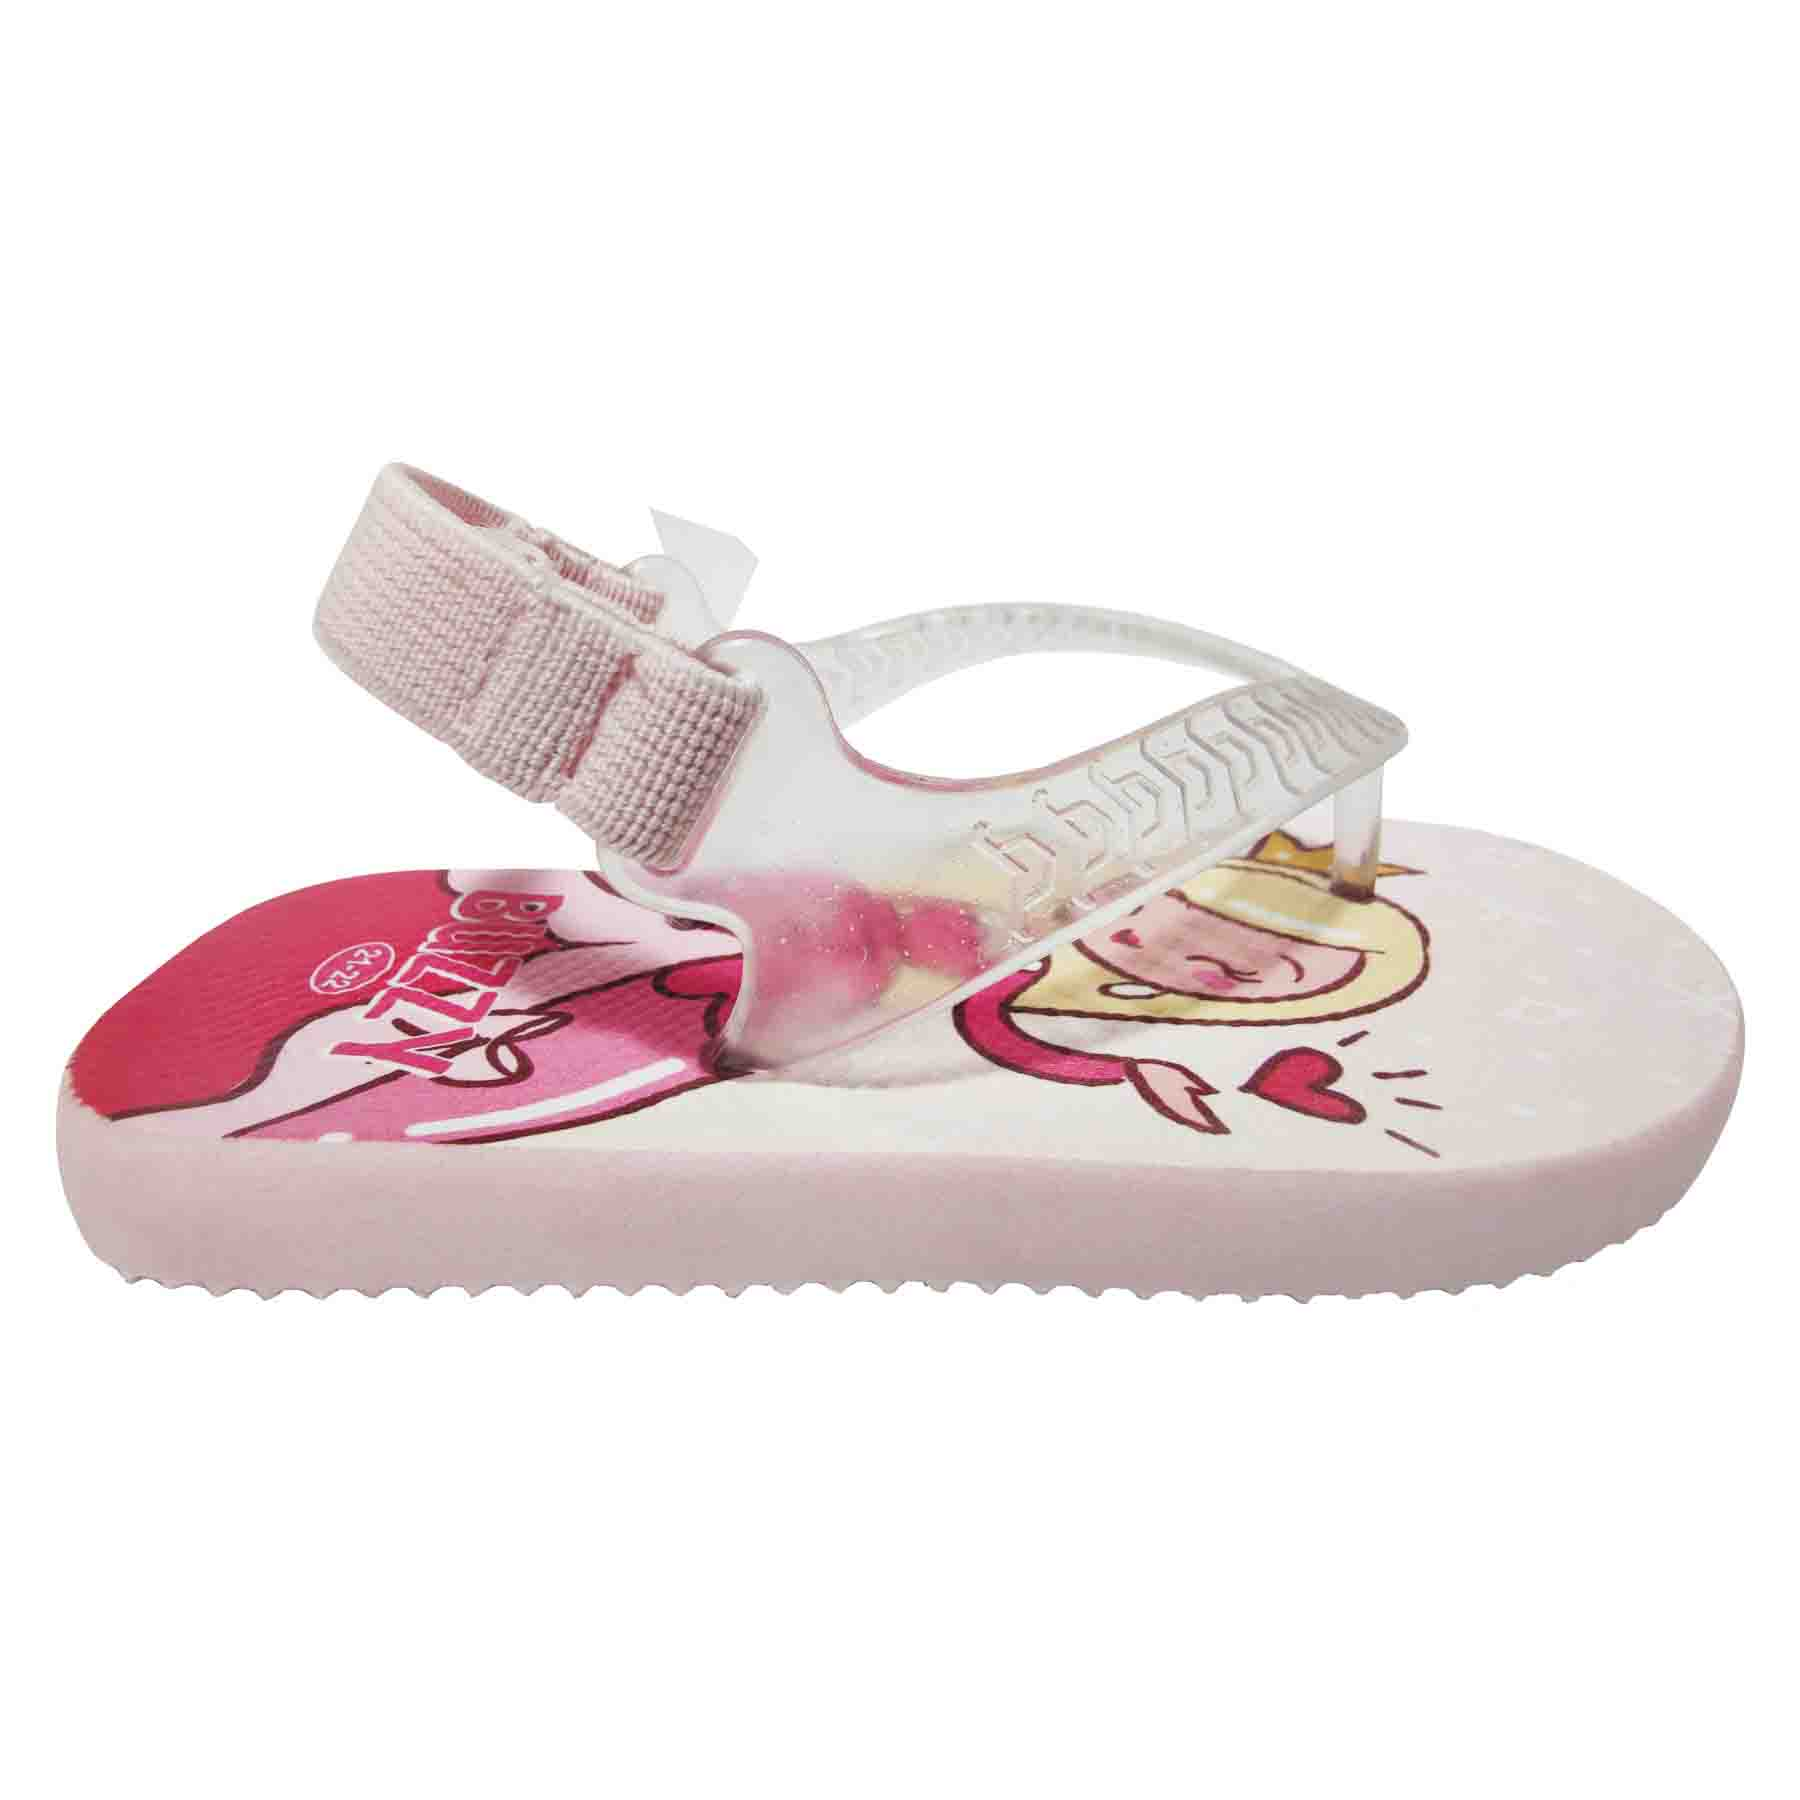 Chinelo Bebê Buzzy Sandália Infantil Princesa Meninas BZ017